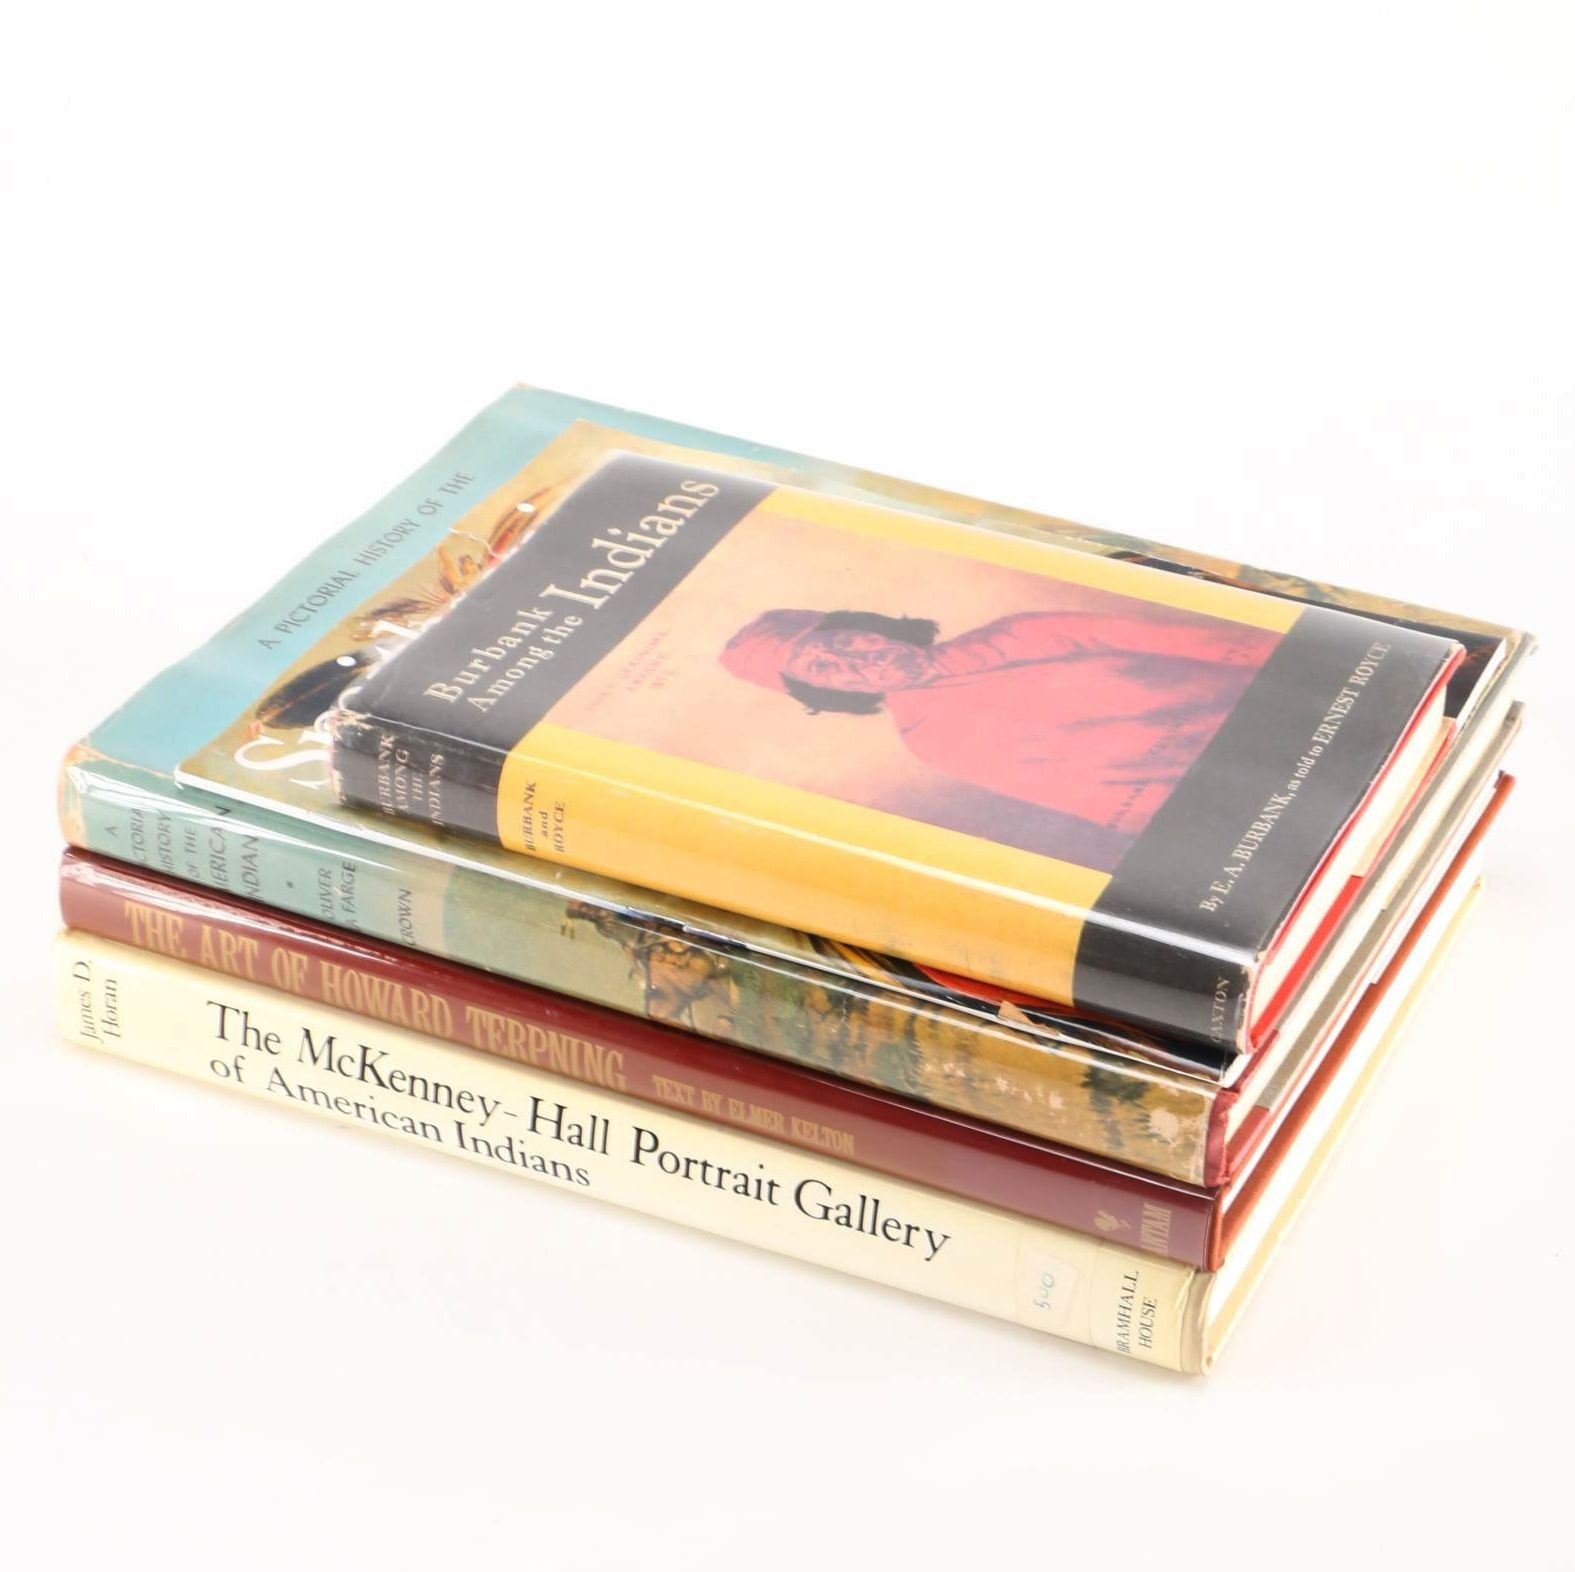 Assortment of Native American Art Books